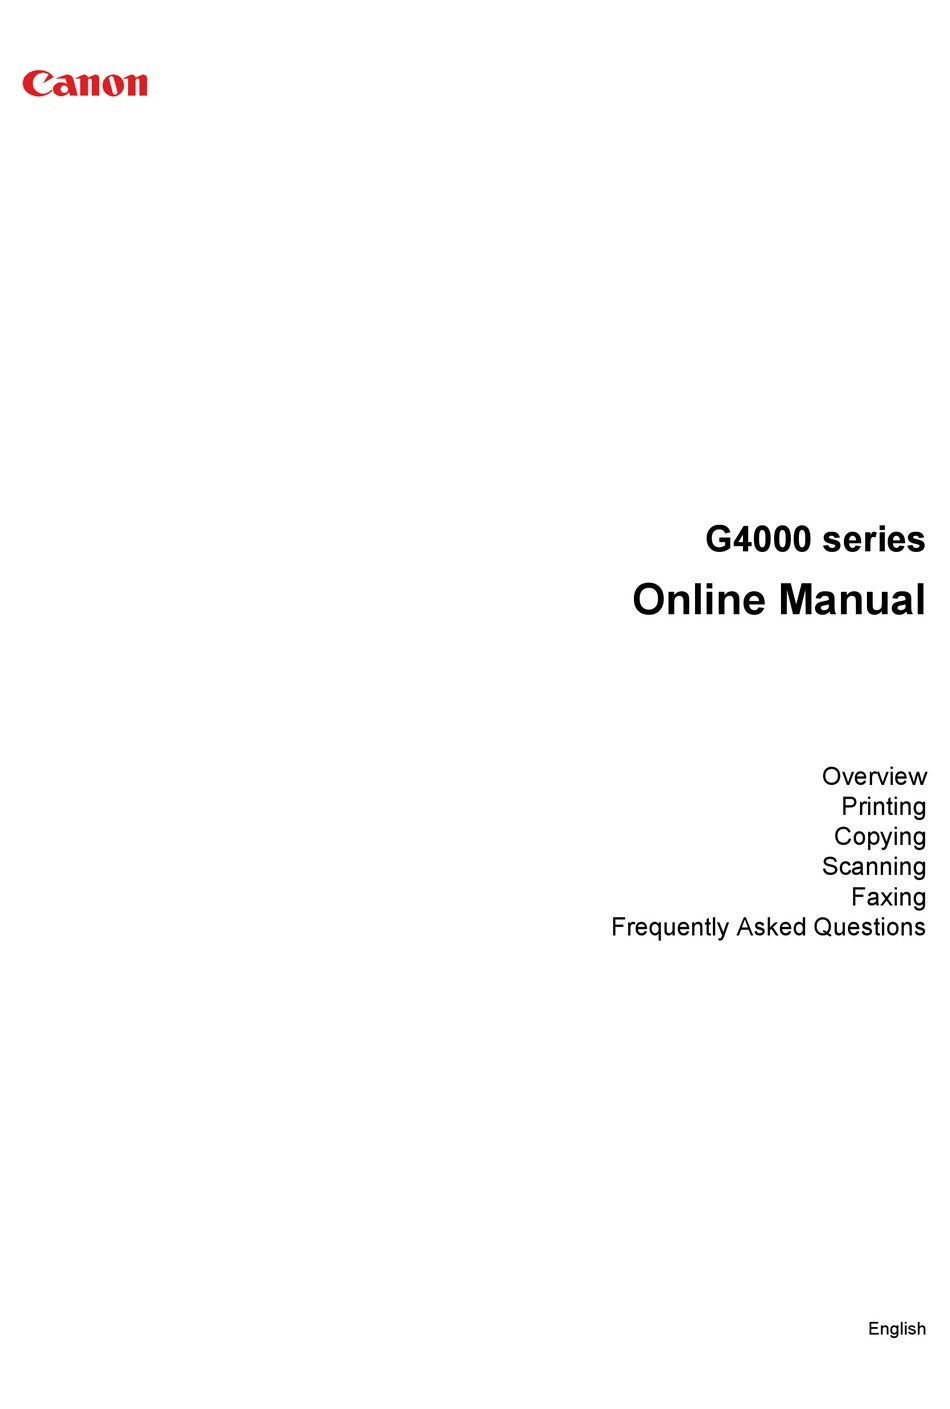 Driver Canon G2000 Offline : driver, canon, g2000, offline, CANON, G4000, SERIES, ONLINE, MANUAL, Download, ManualsLib